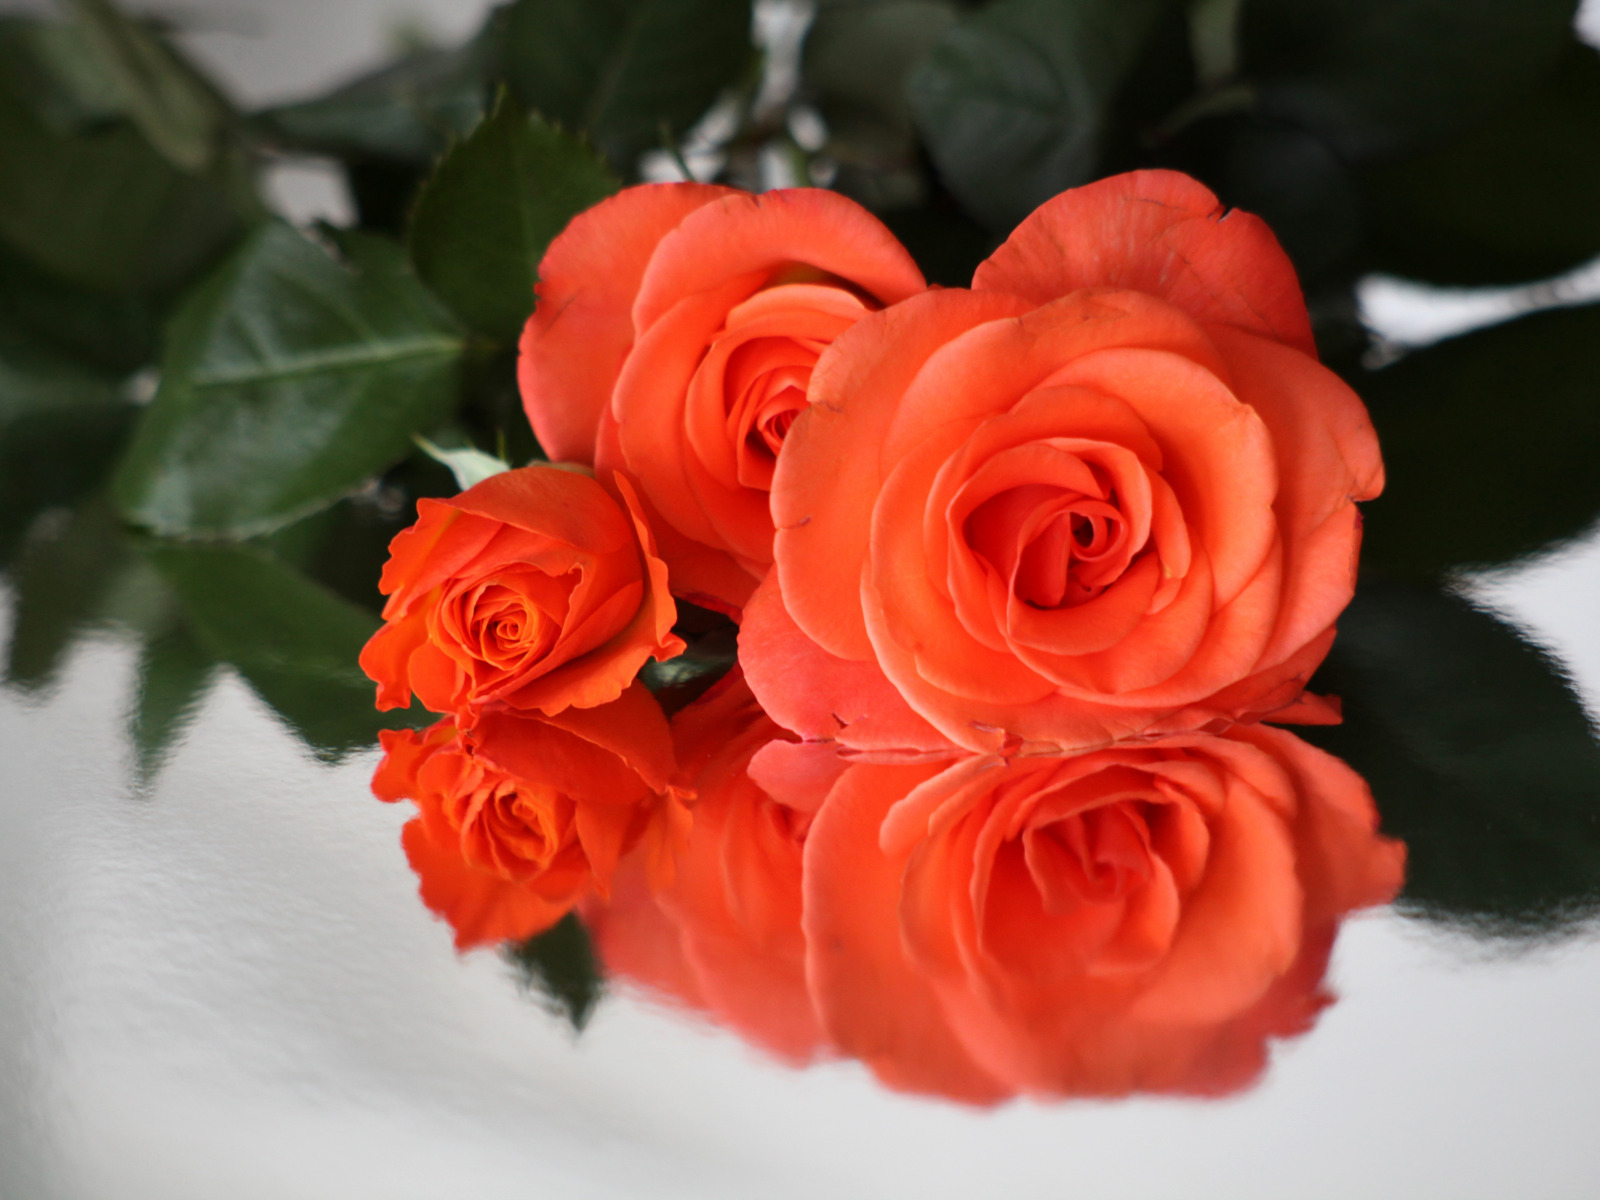 Открытка Букет роз для Тебя! - Цветы подруга Pinterest Floral 38